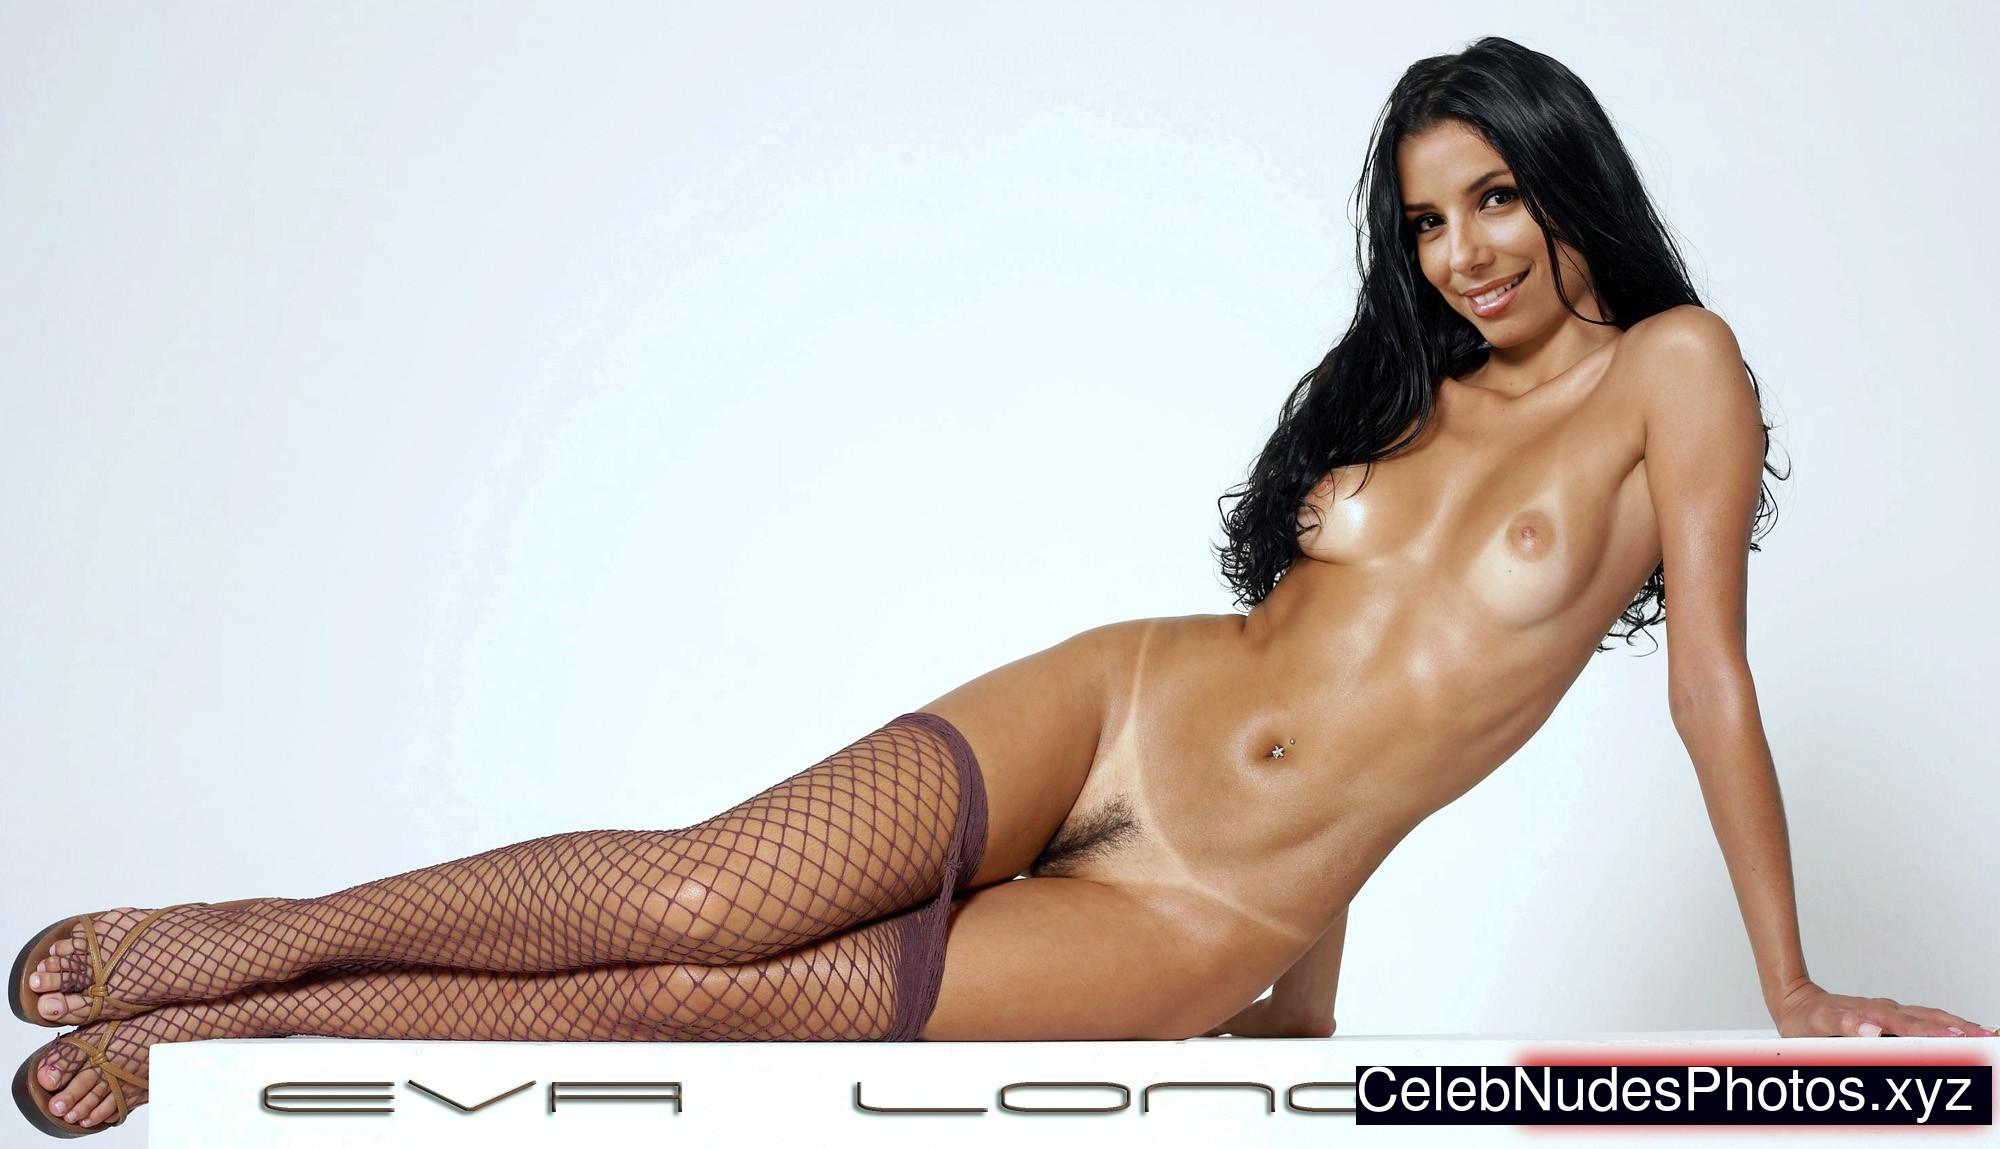 Eva Longoria Real Celebrity Nude sexy 23